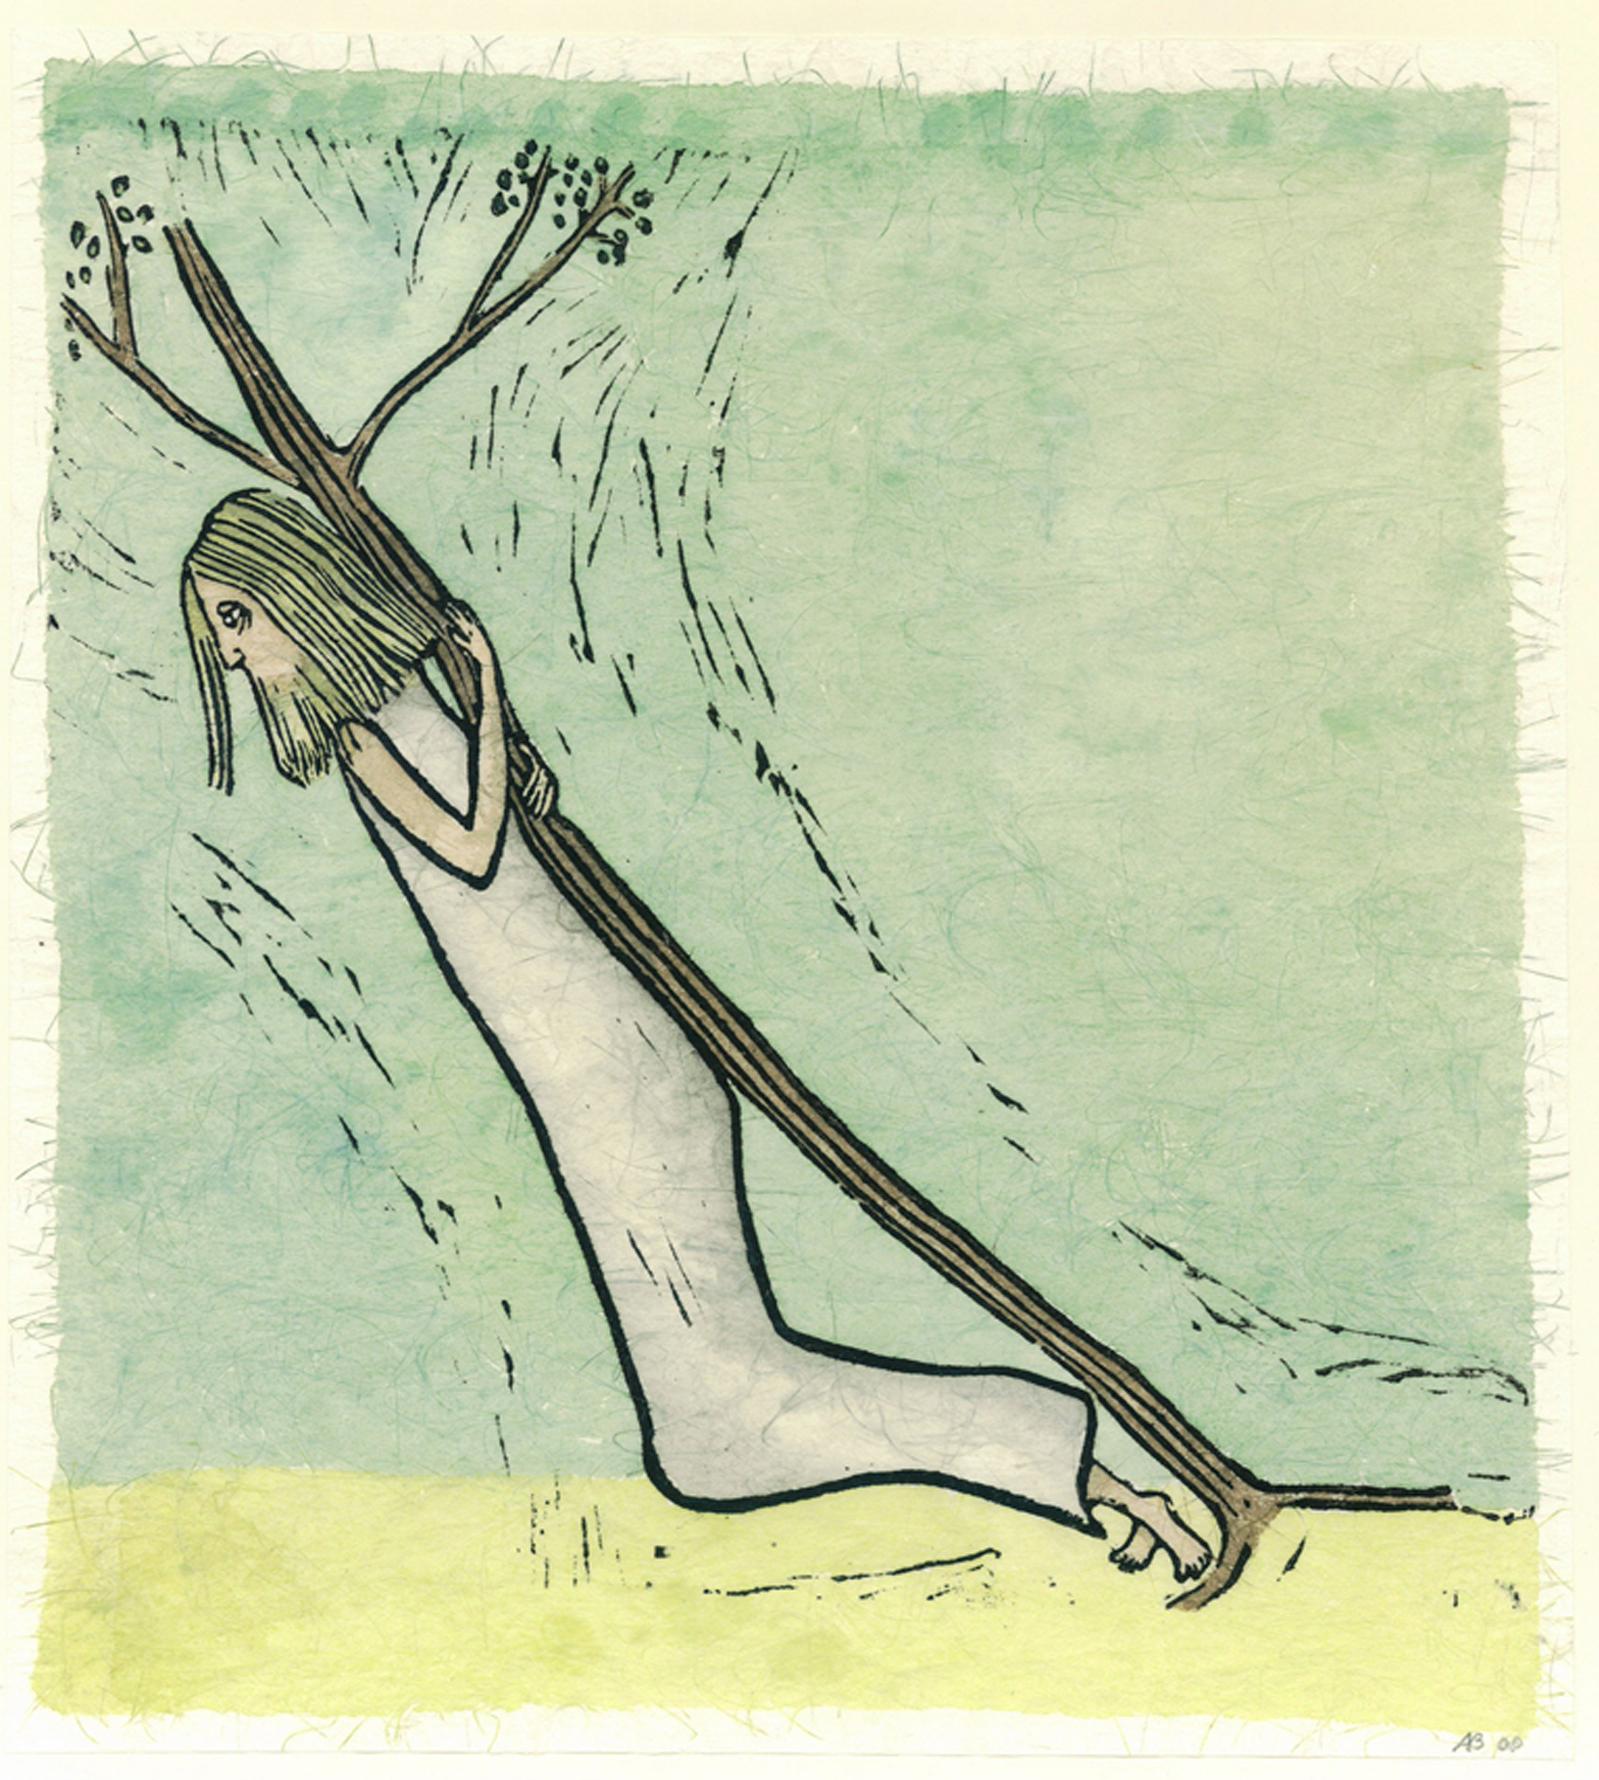 ...en de boom bloeit VII kruisweg, ingekleurde linosnede